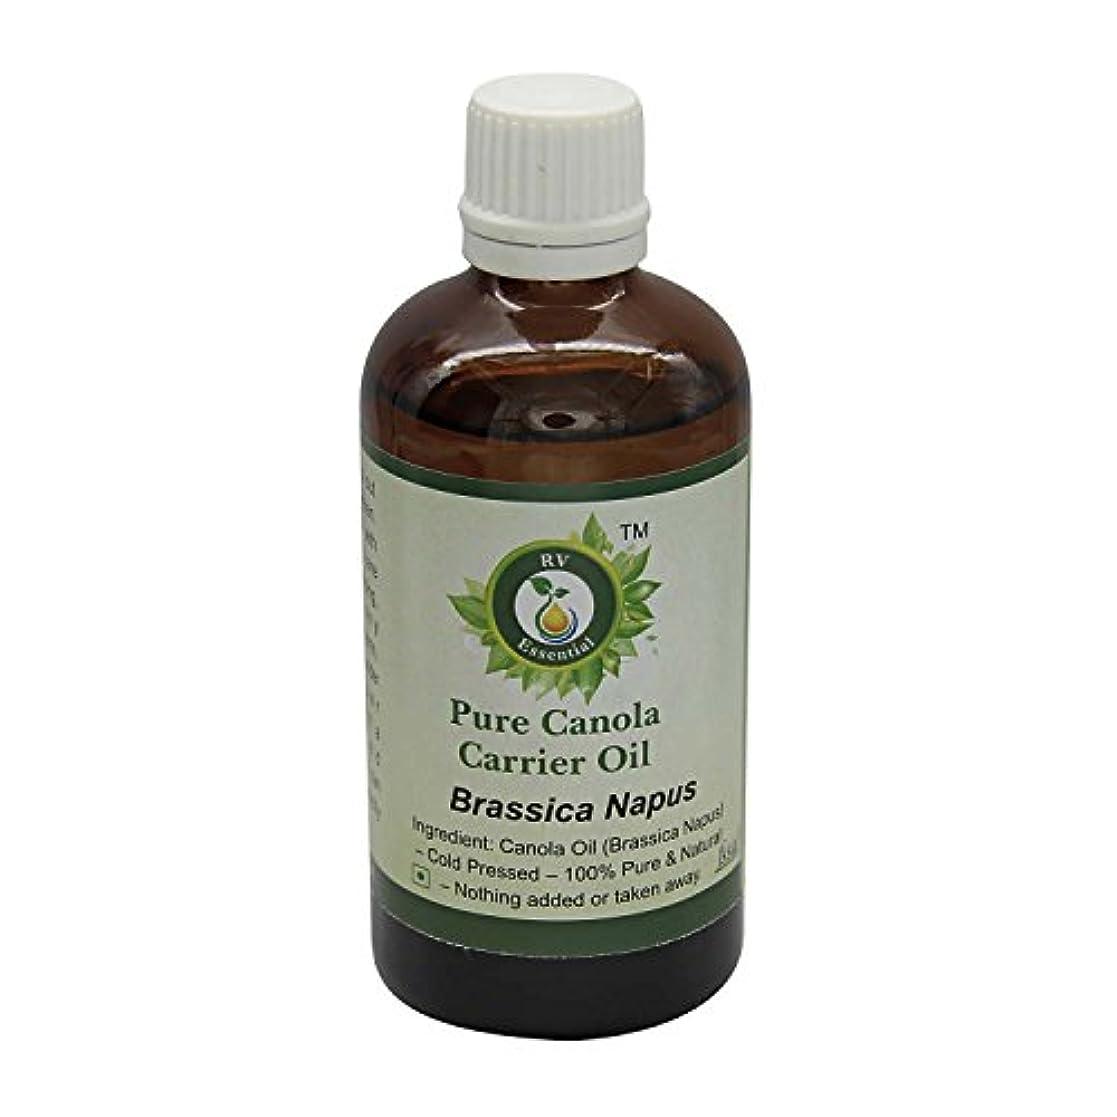 R V Essential 純粋なキャノーラキャリアオイル10ml (0.338oz)- Brassica Napus (100%ピュア&ナチュラルコールドPressed) Pure Canola Carrier Oil